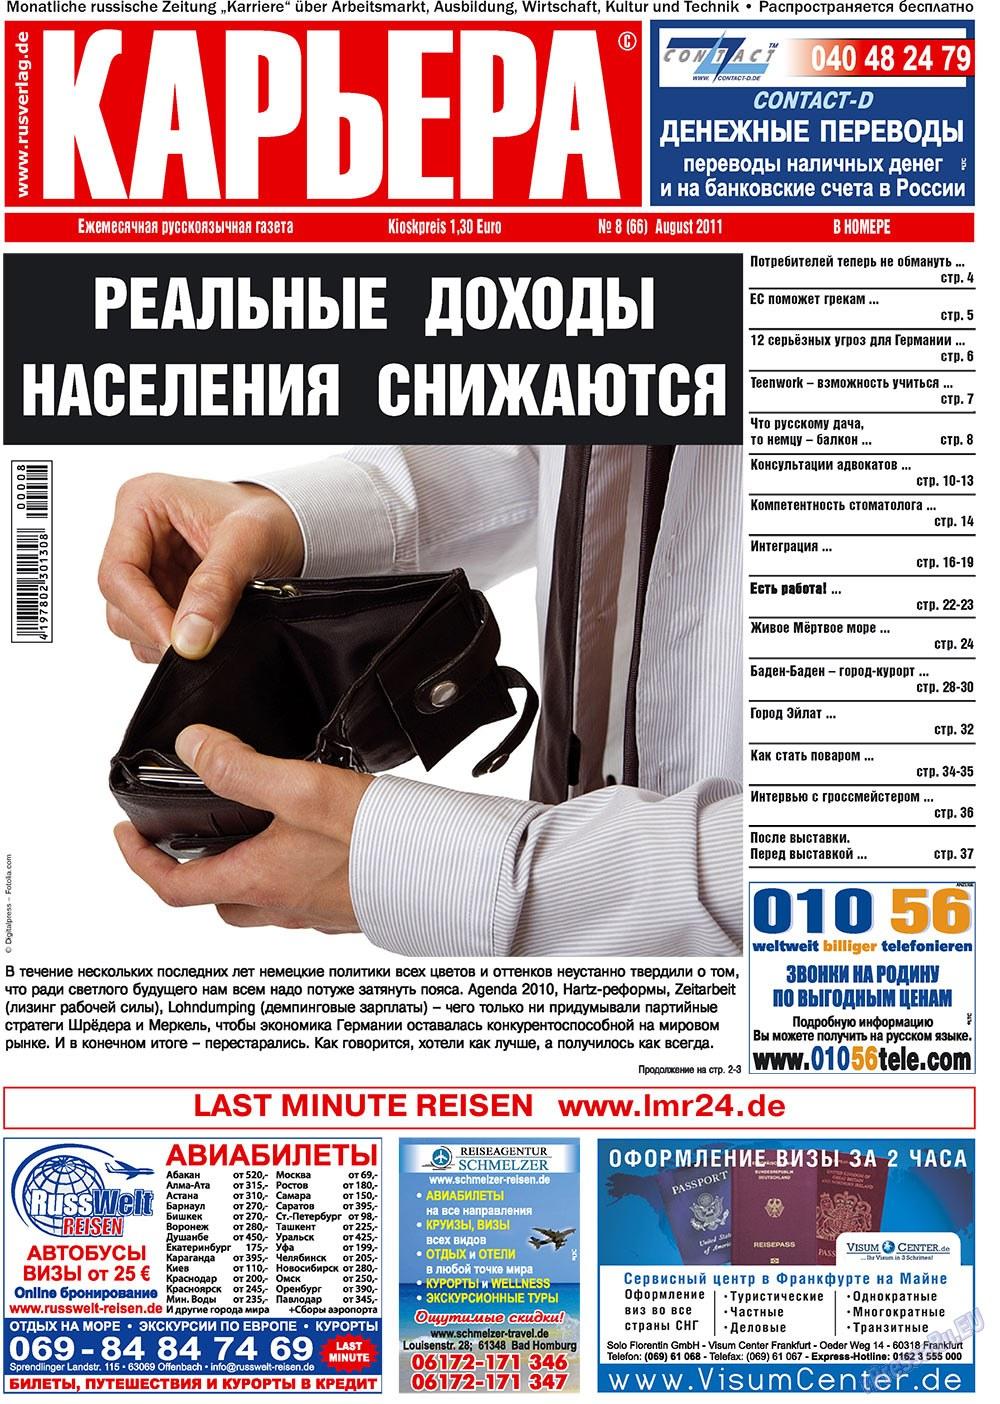 Карьера (газета). 2011 год, номер 8, стр. 1